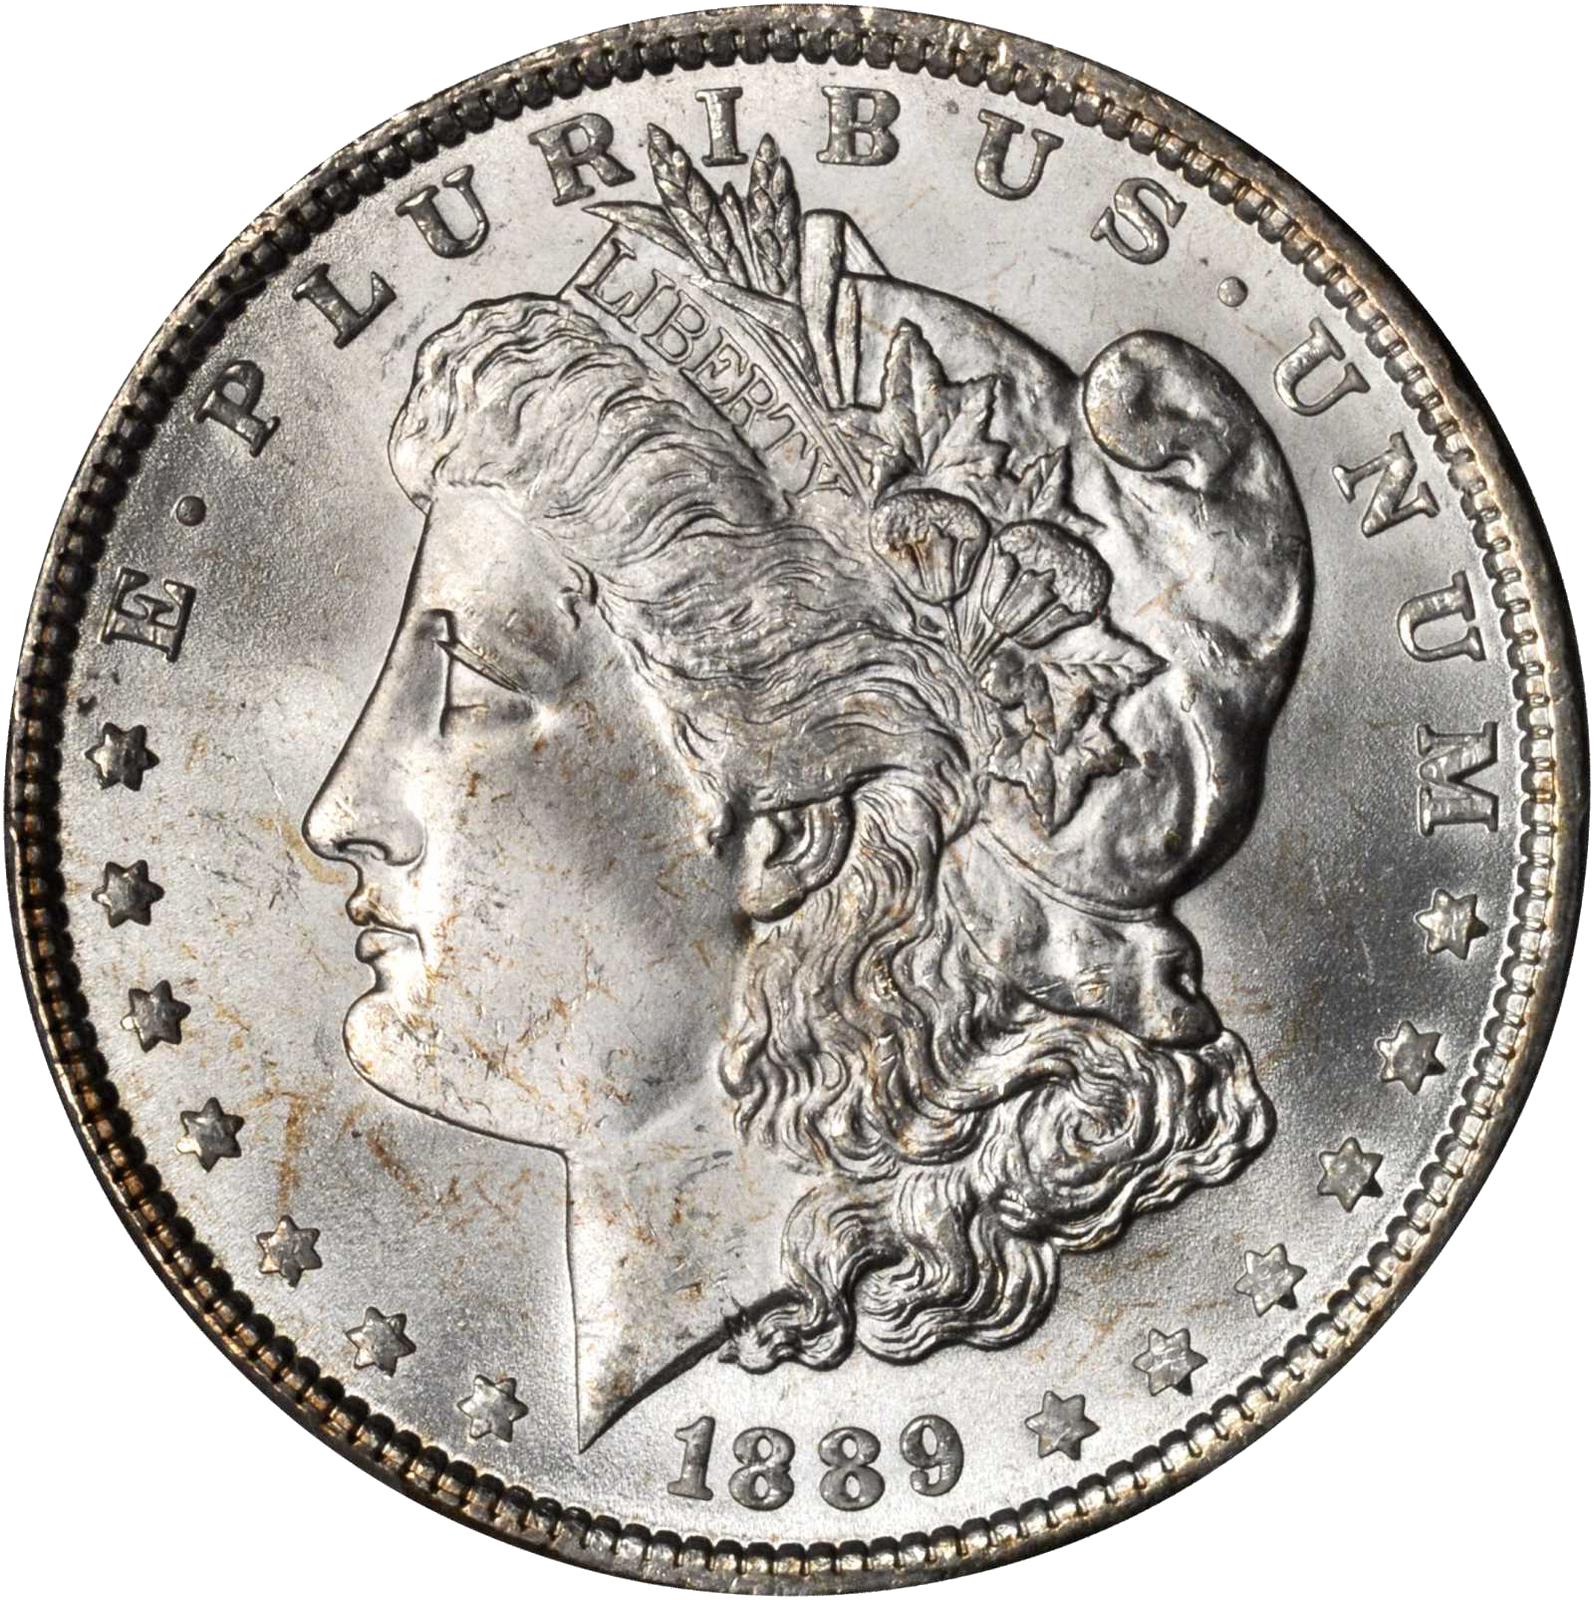 Value Of 1889 Morgan Dollar Rare Silver Dollar Buyers